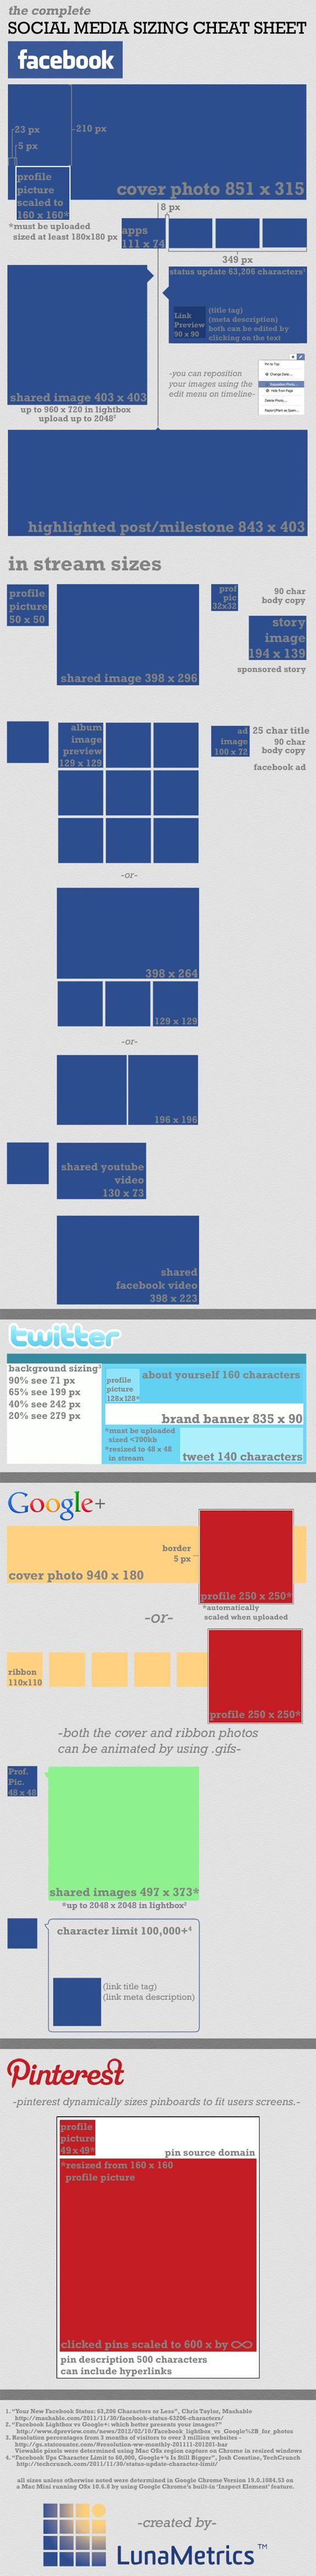 Social Media Sizing Cheat Sheet - finally